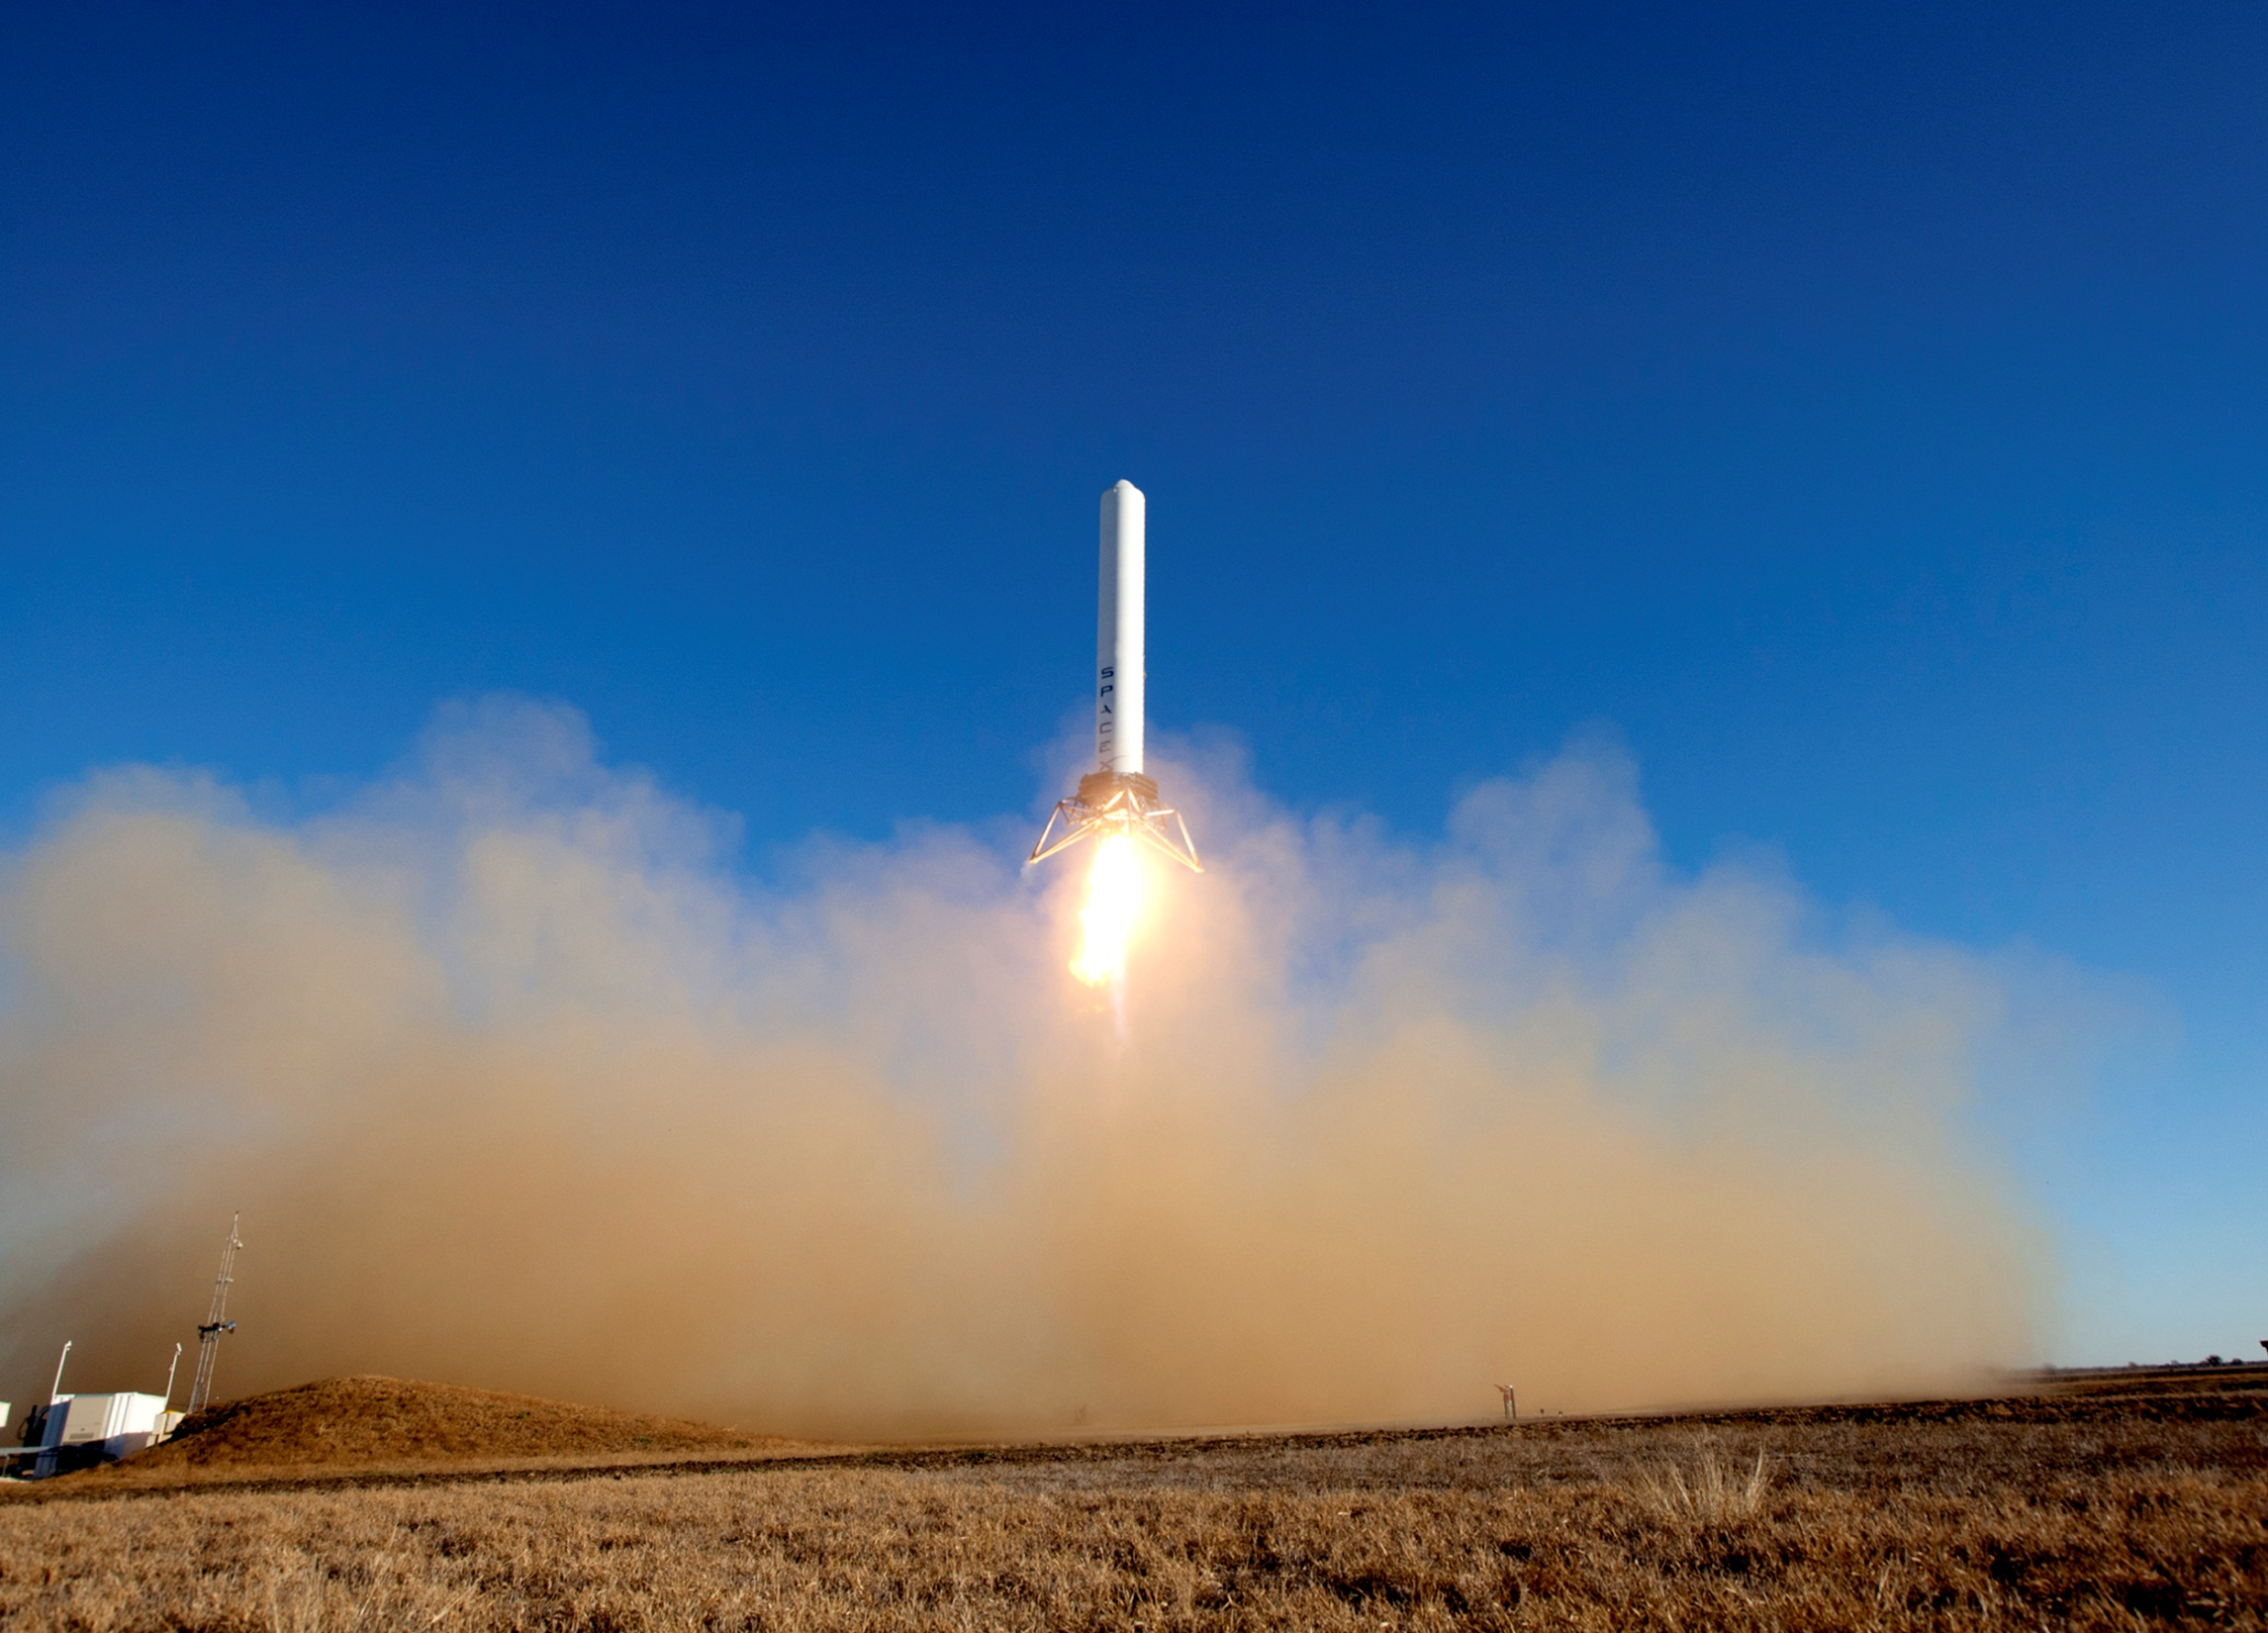 SpaceX's Experimental Grasshopper Rocket Makes 3rd Test Hop